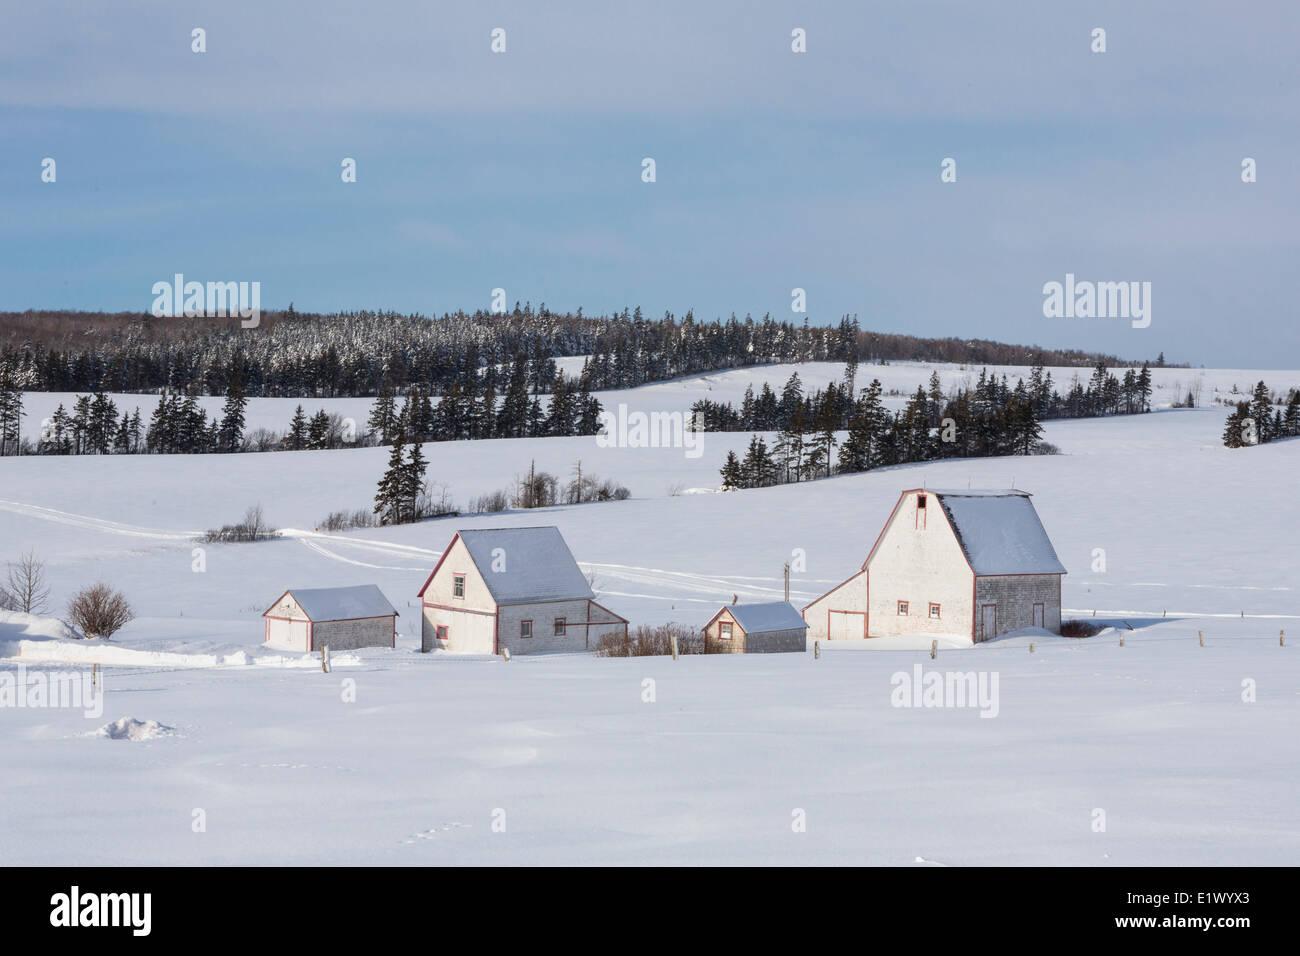 Barns in winter, Irishtown, Prince Edward Island, Canada - Stock Image